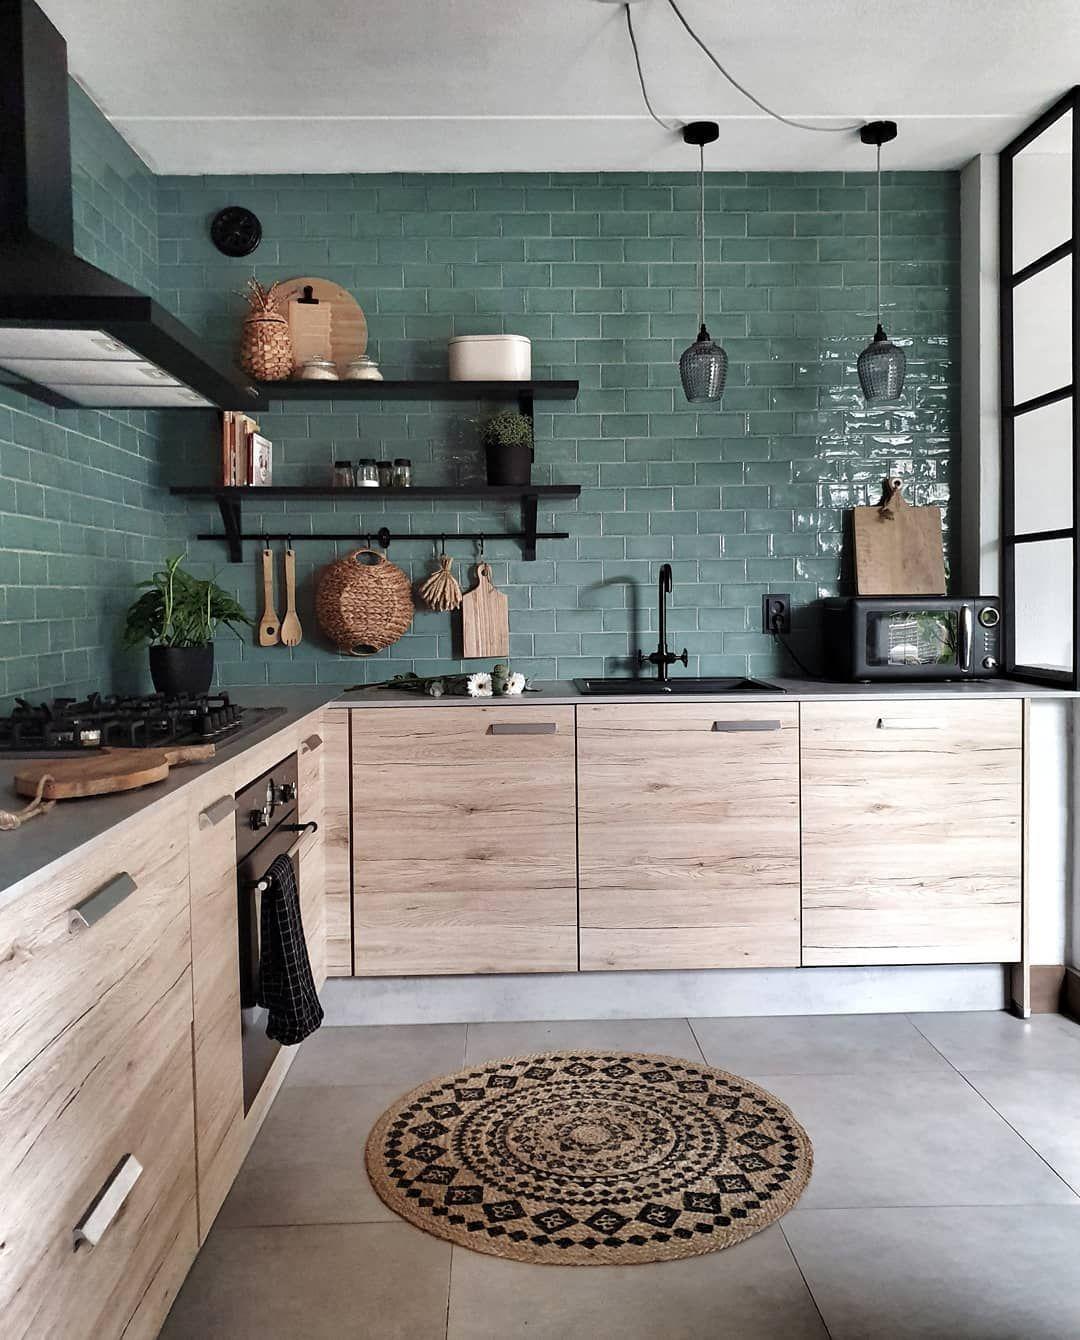 مطبخ 100 منتج En 2020 Diseno De Interiores De Cocina Ideas De Decoracion De Cocina Cocinas De Casa